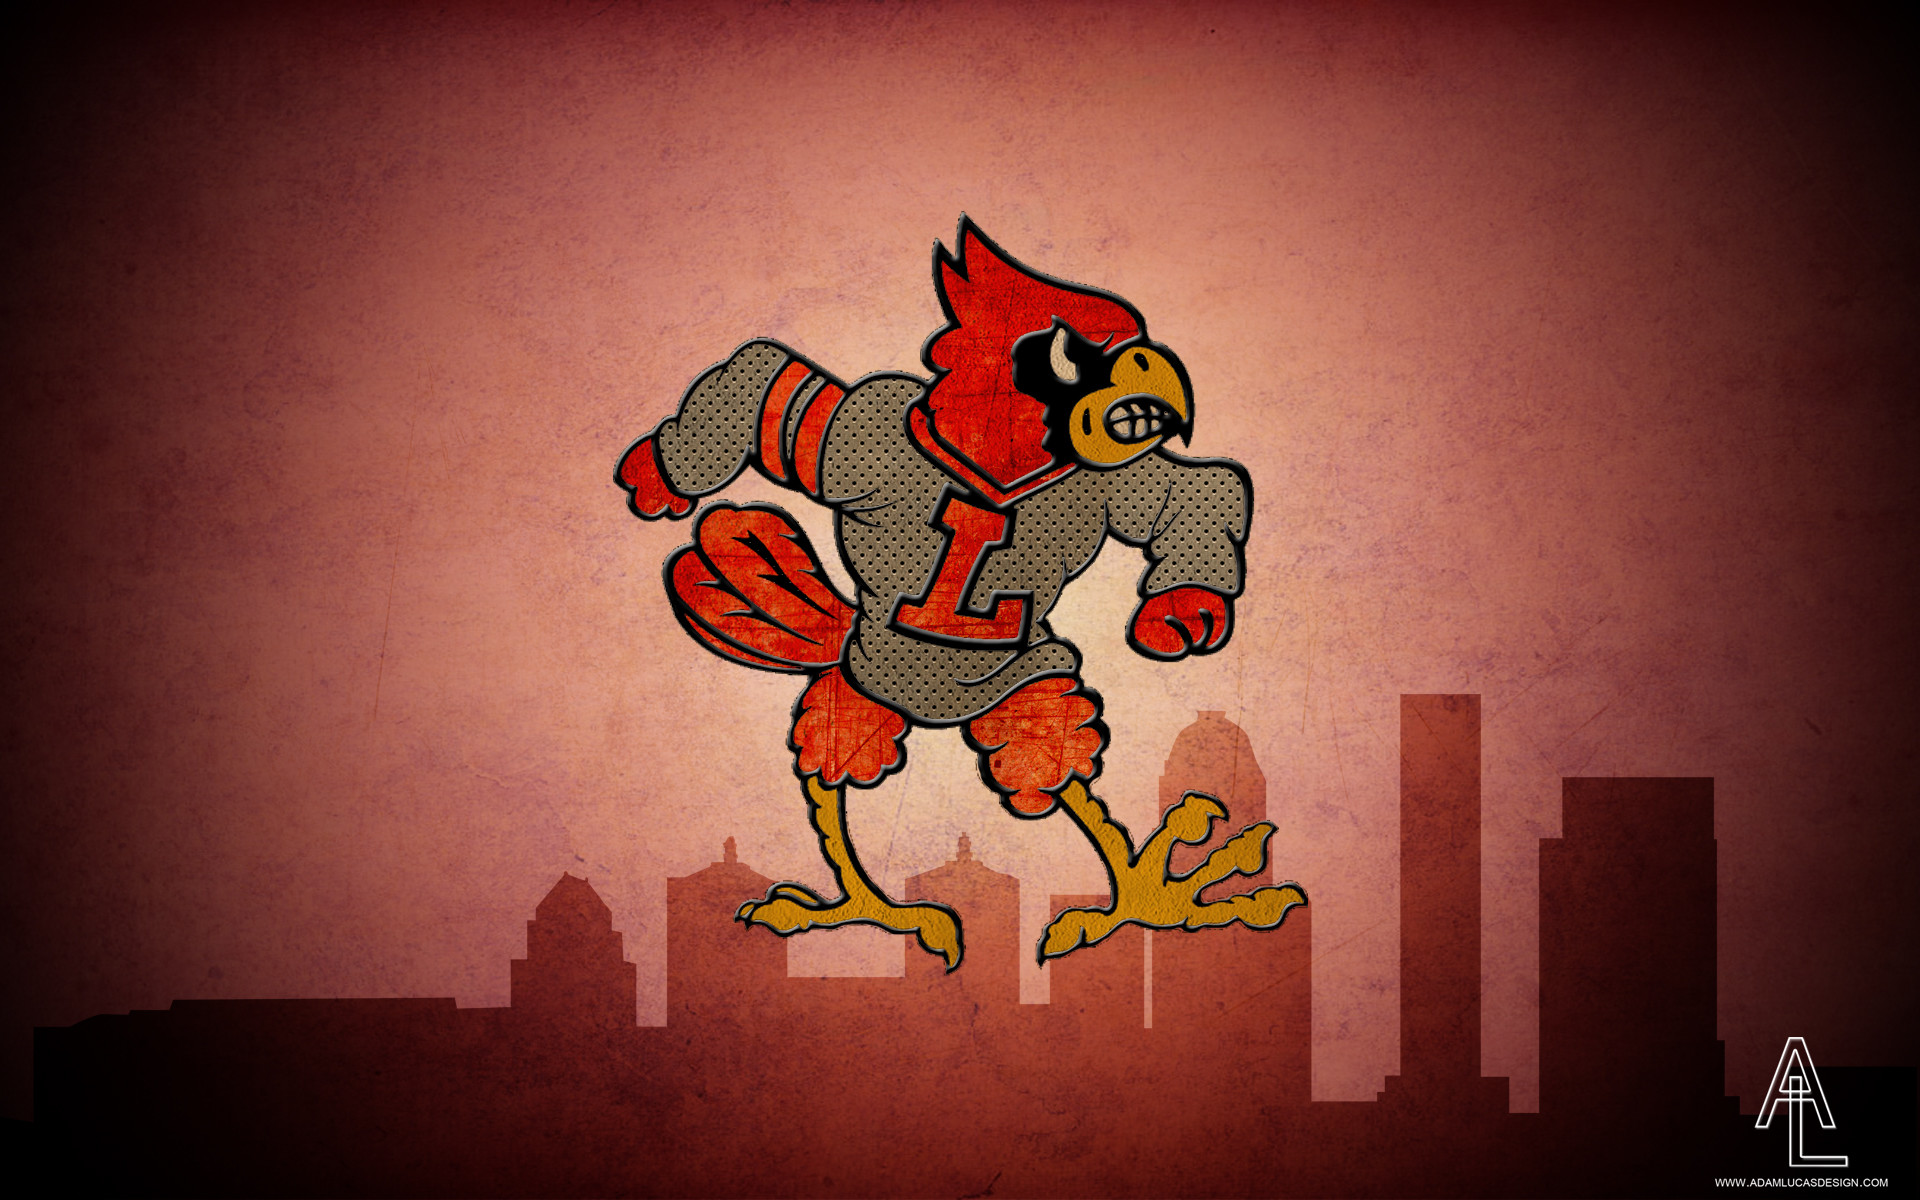 scores, is Louisville Cardinal Desktop Wallpaper valuable resource .